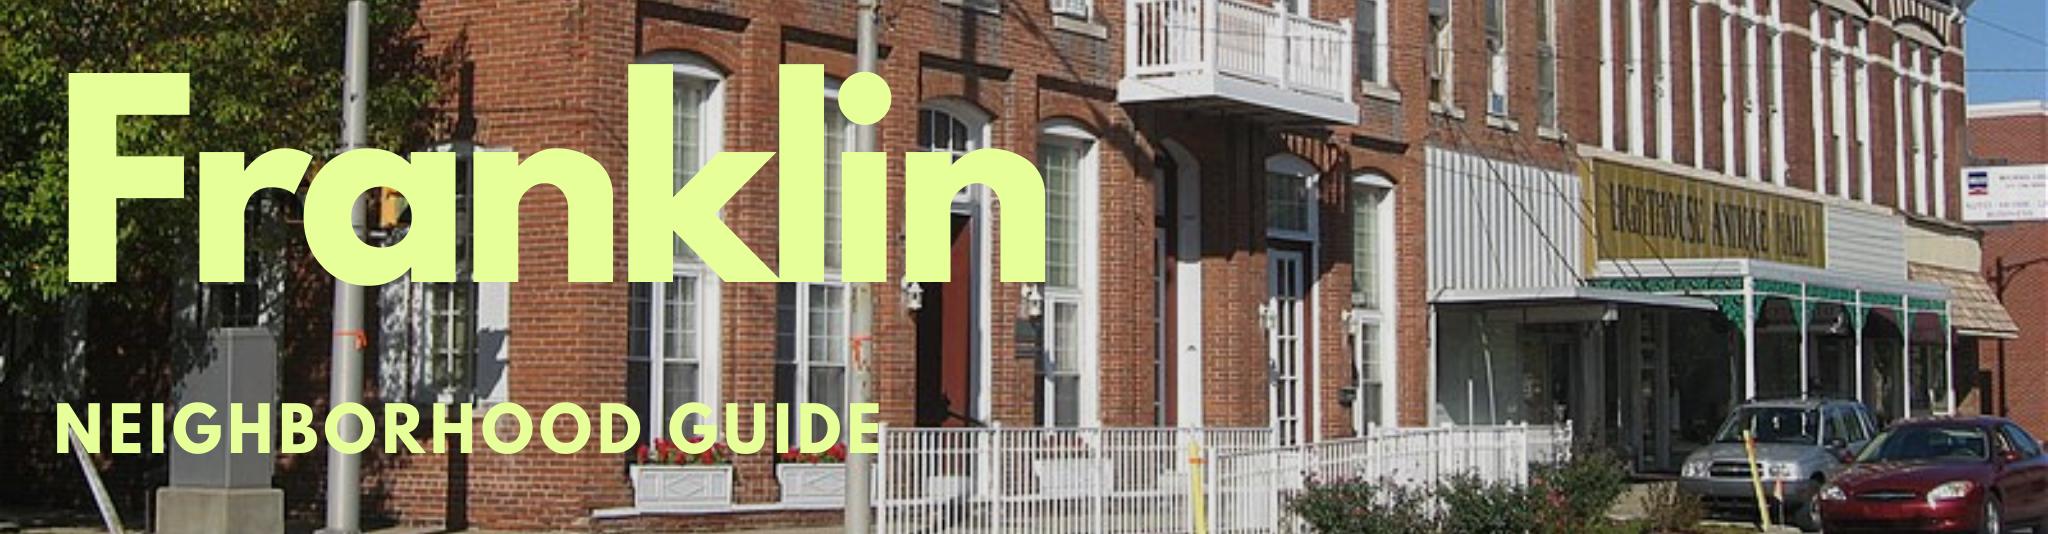 Franklin Indiana real estate neighborhood guide